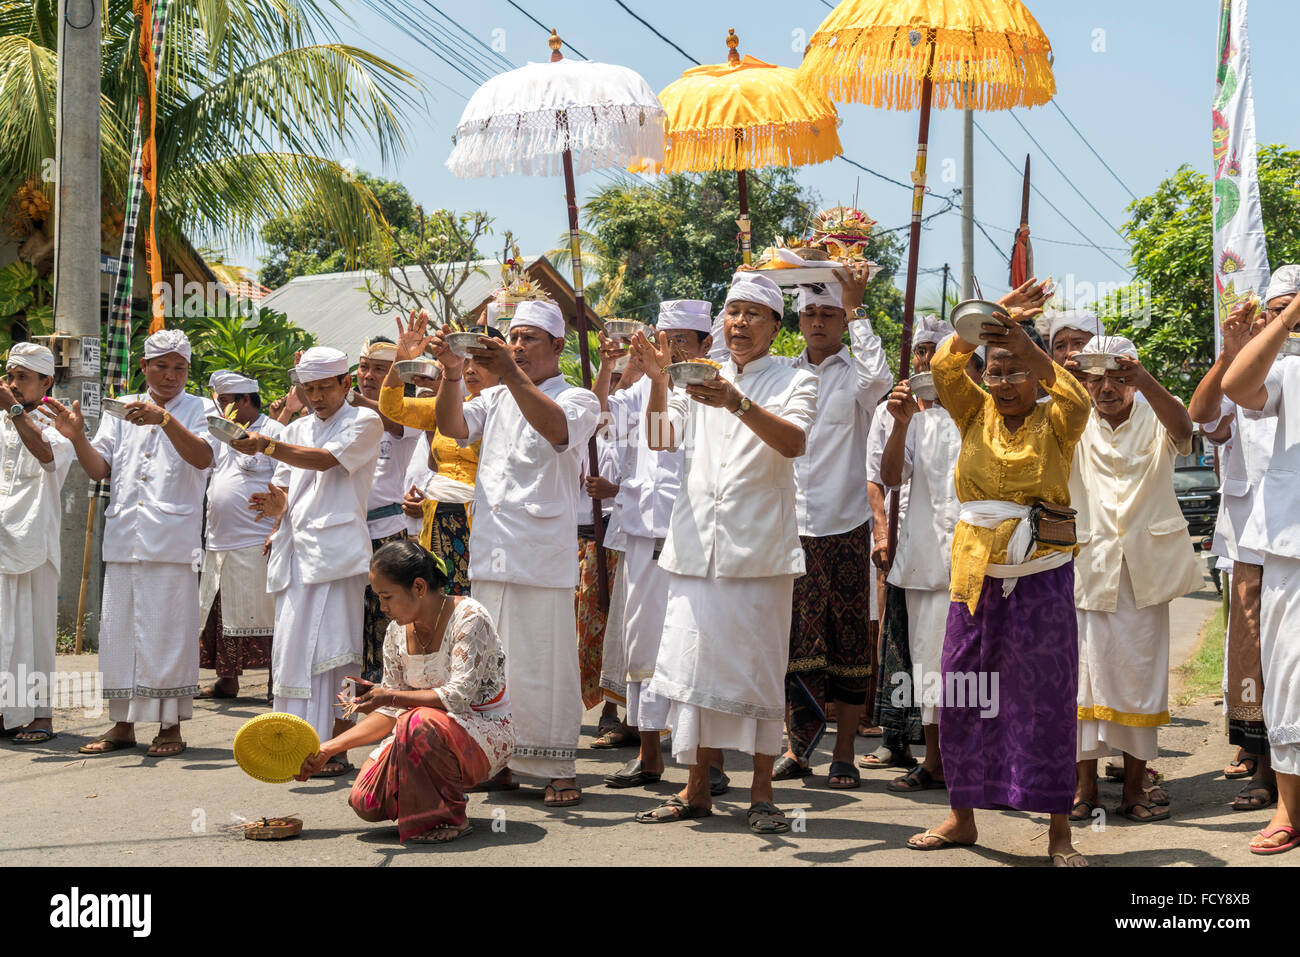 balinese temple ceremony in Lovina, Bali, Indonesia - Stock Image